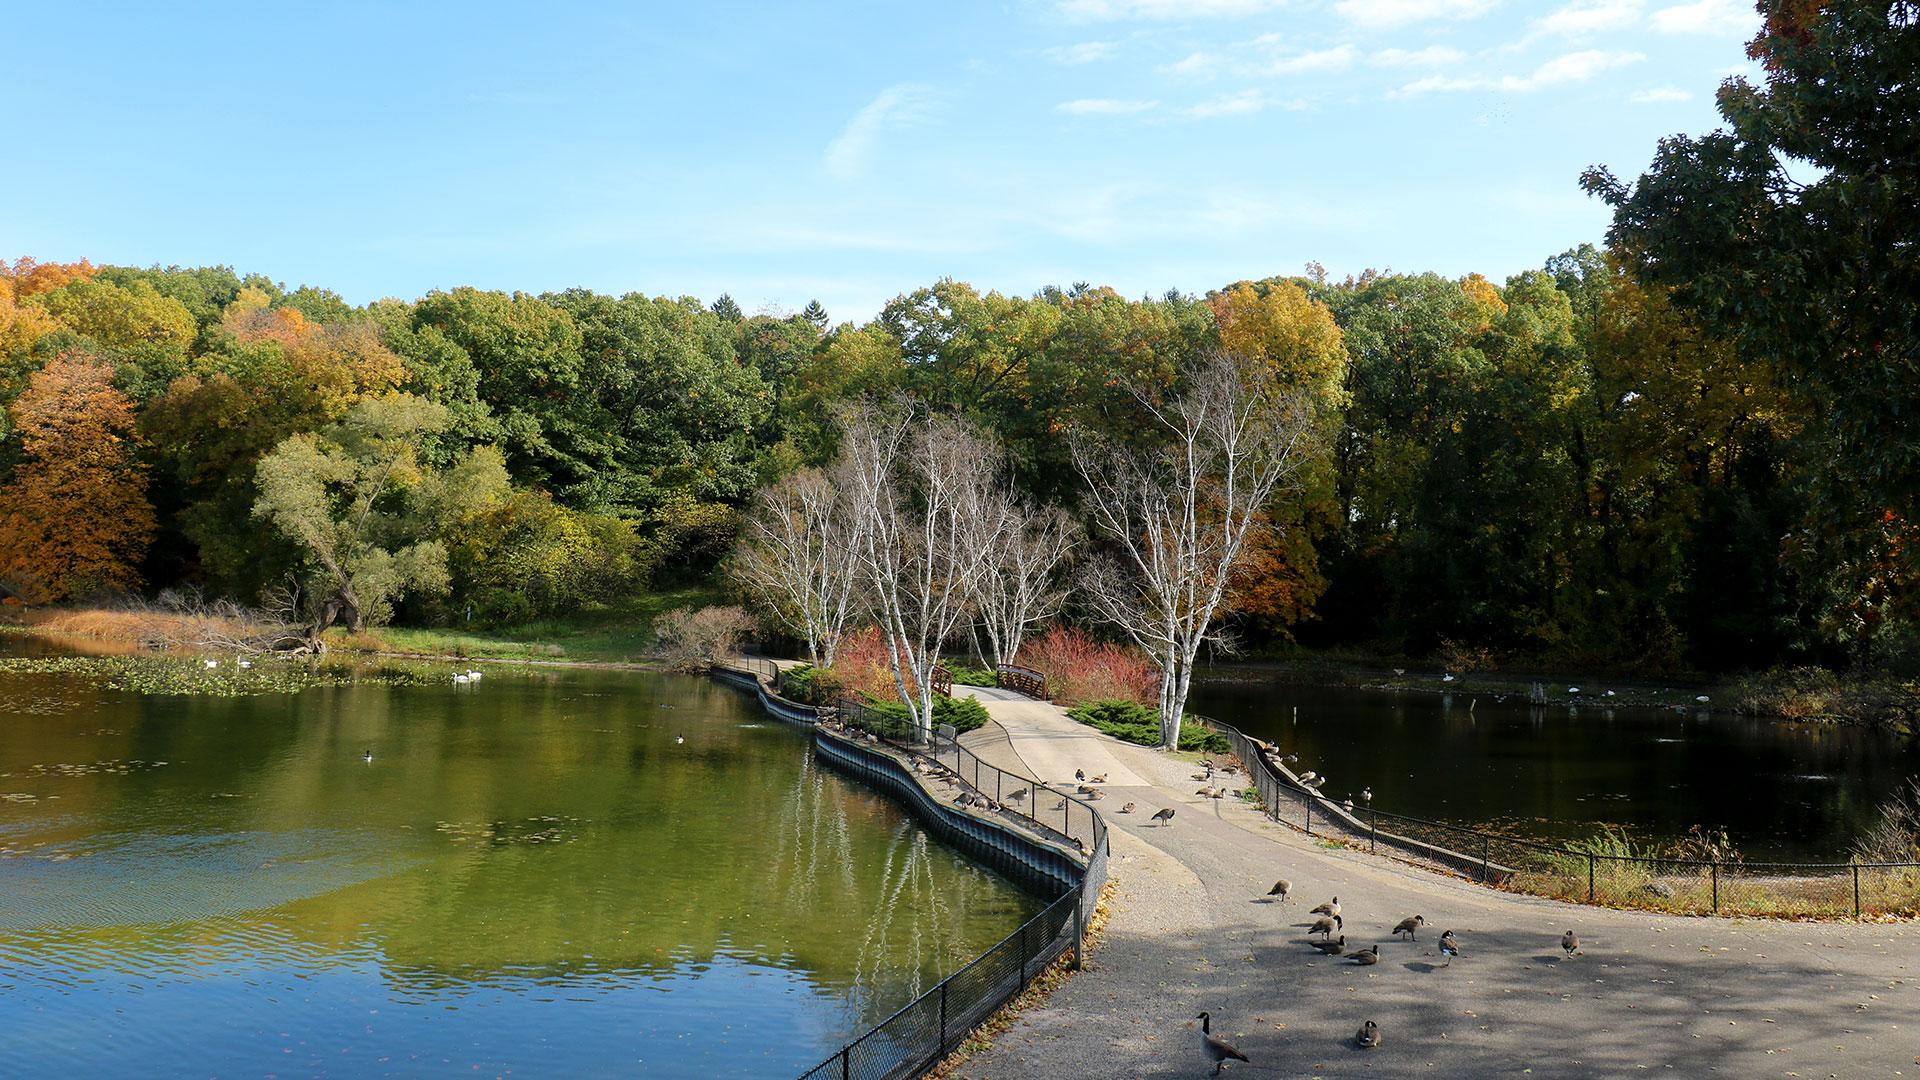 View of the Kellogg Bird Sanctuary bridge.